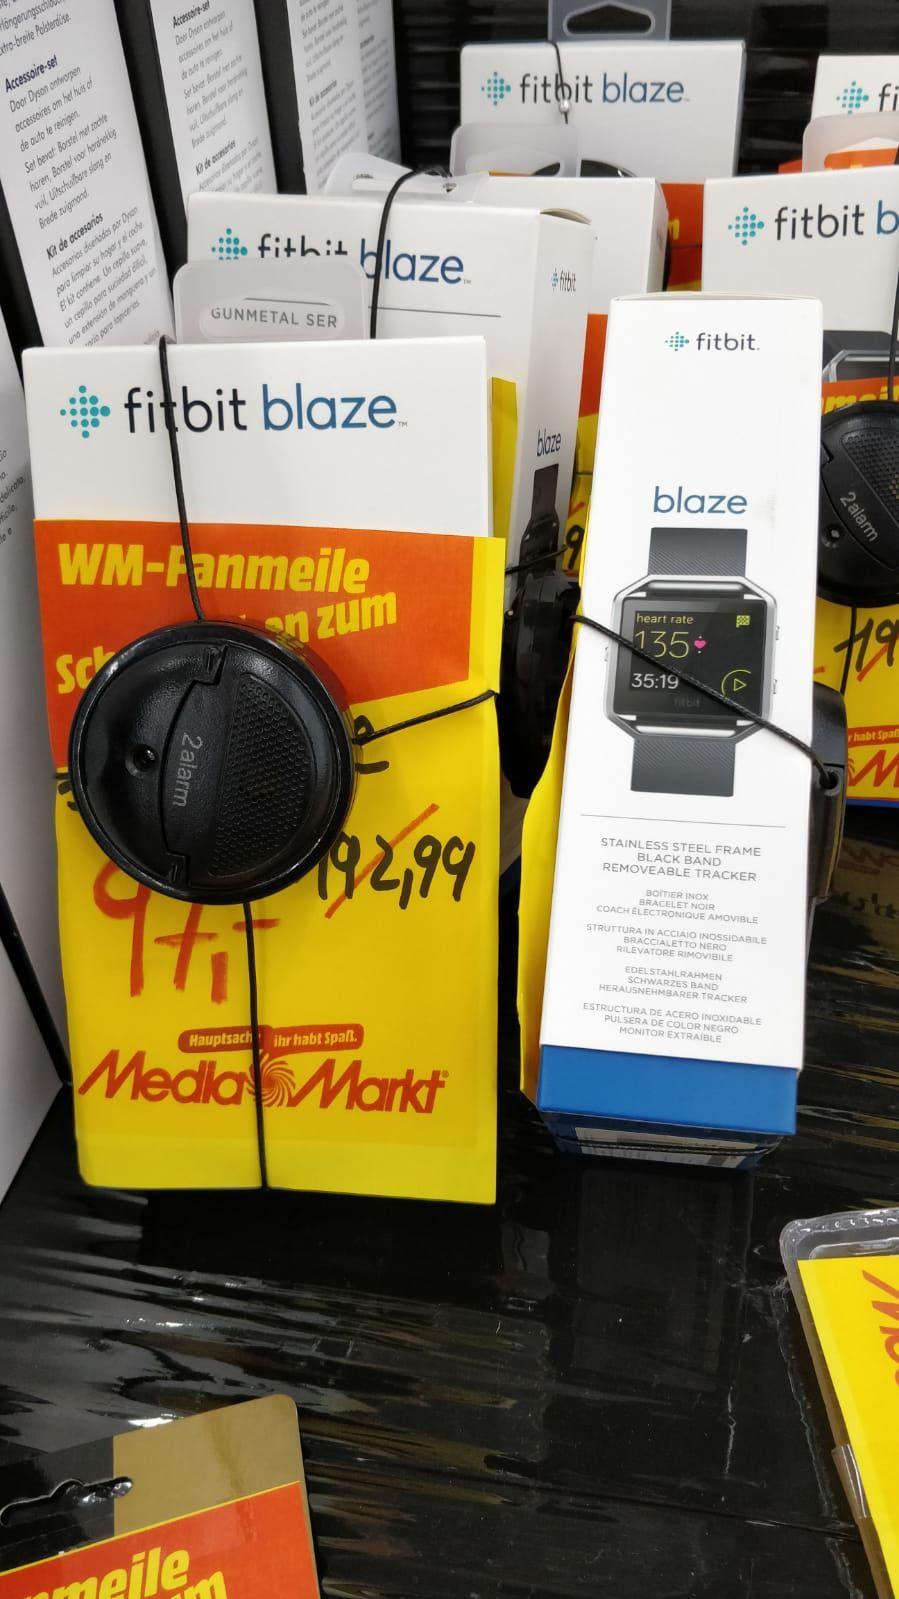 Fitbit Blaze Schweinfurt Media Markt City